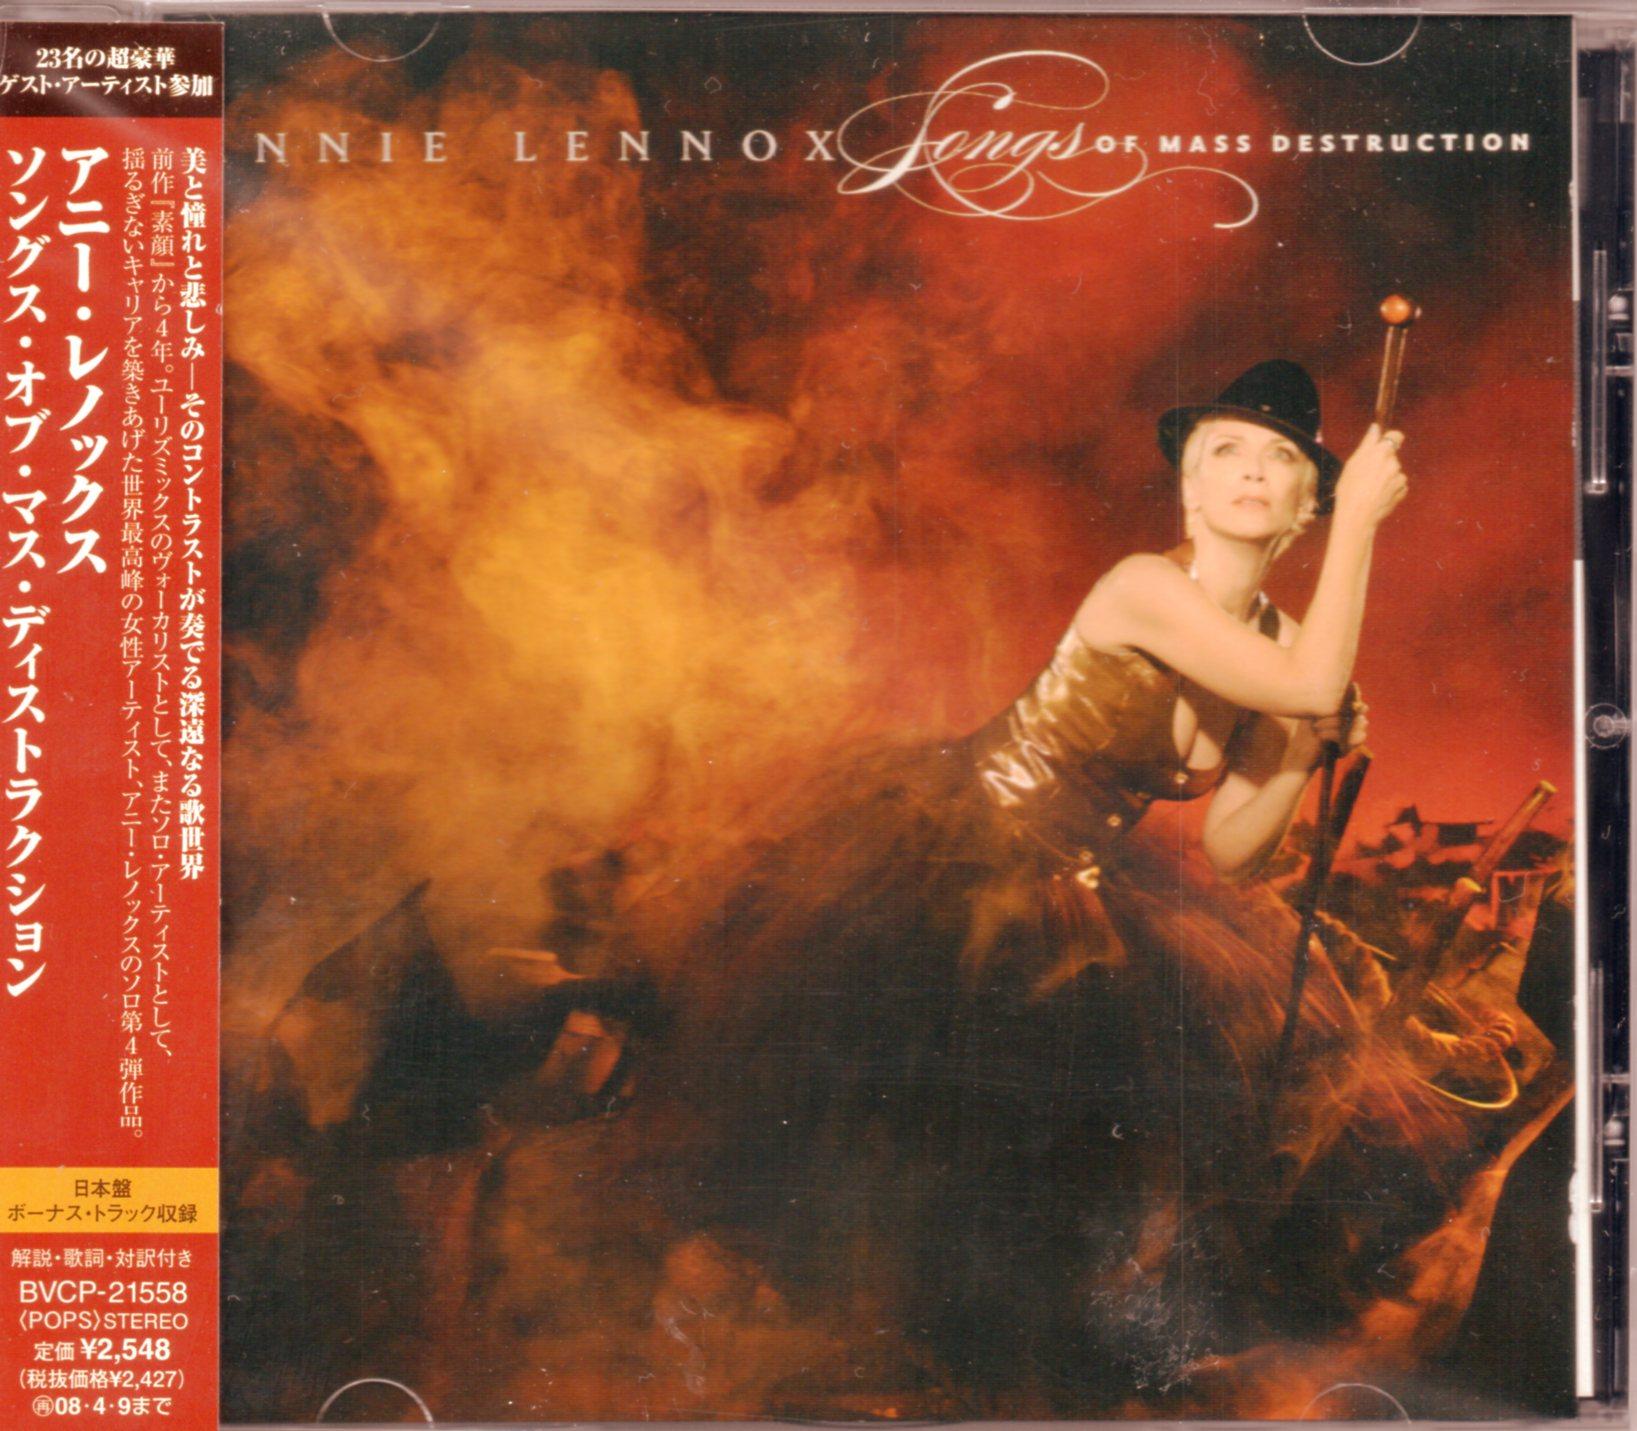 ANNIE LENNOX - Songs of mass destruction - Japan Sampler - - CD